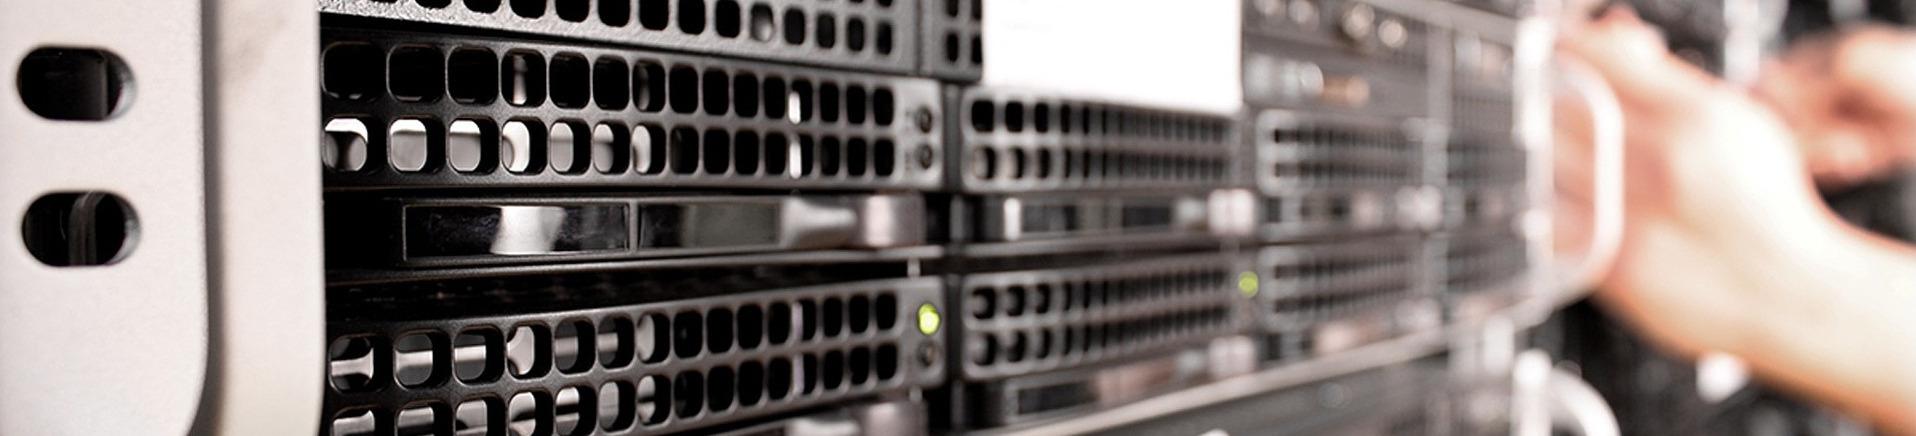 Windows Server 2016, KVM, SSD, 2GB RAM, 2 Kerne, sofort loslegen (PREPAID)